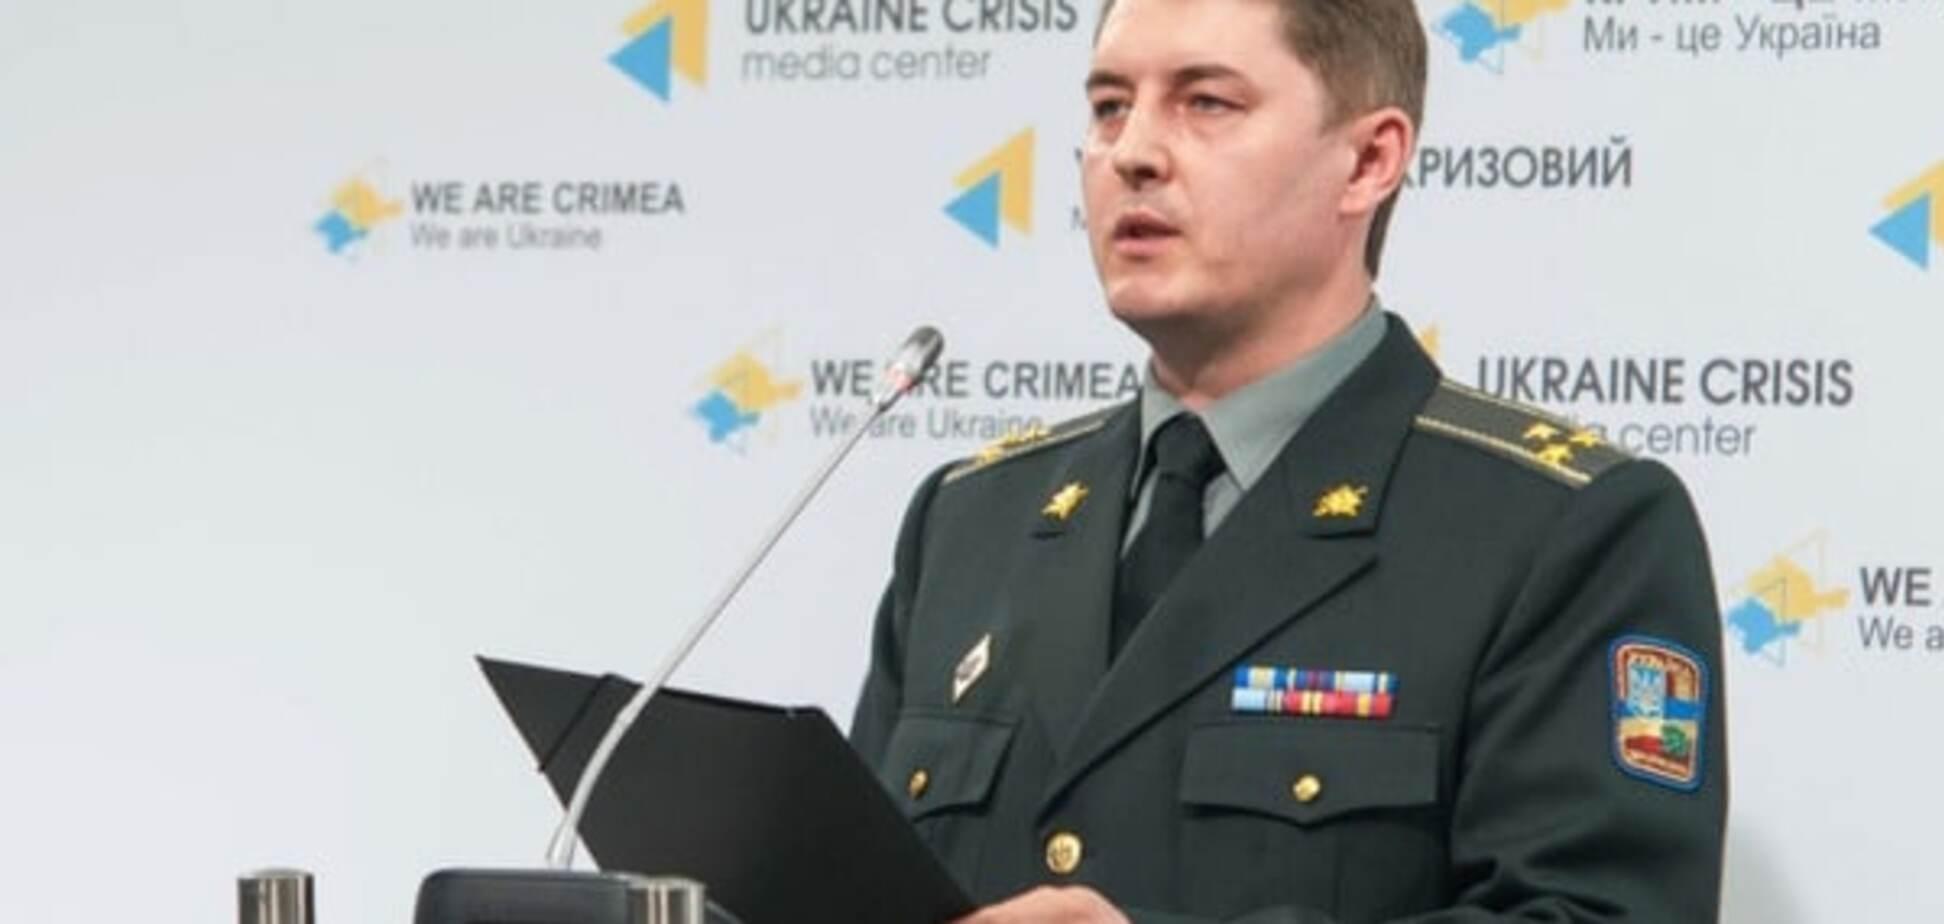 Олександр Мотузяник